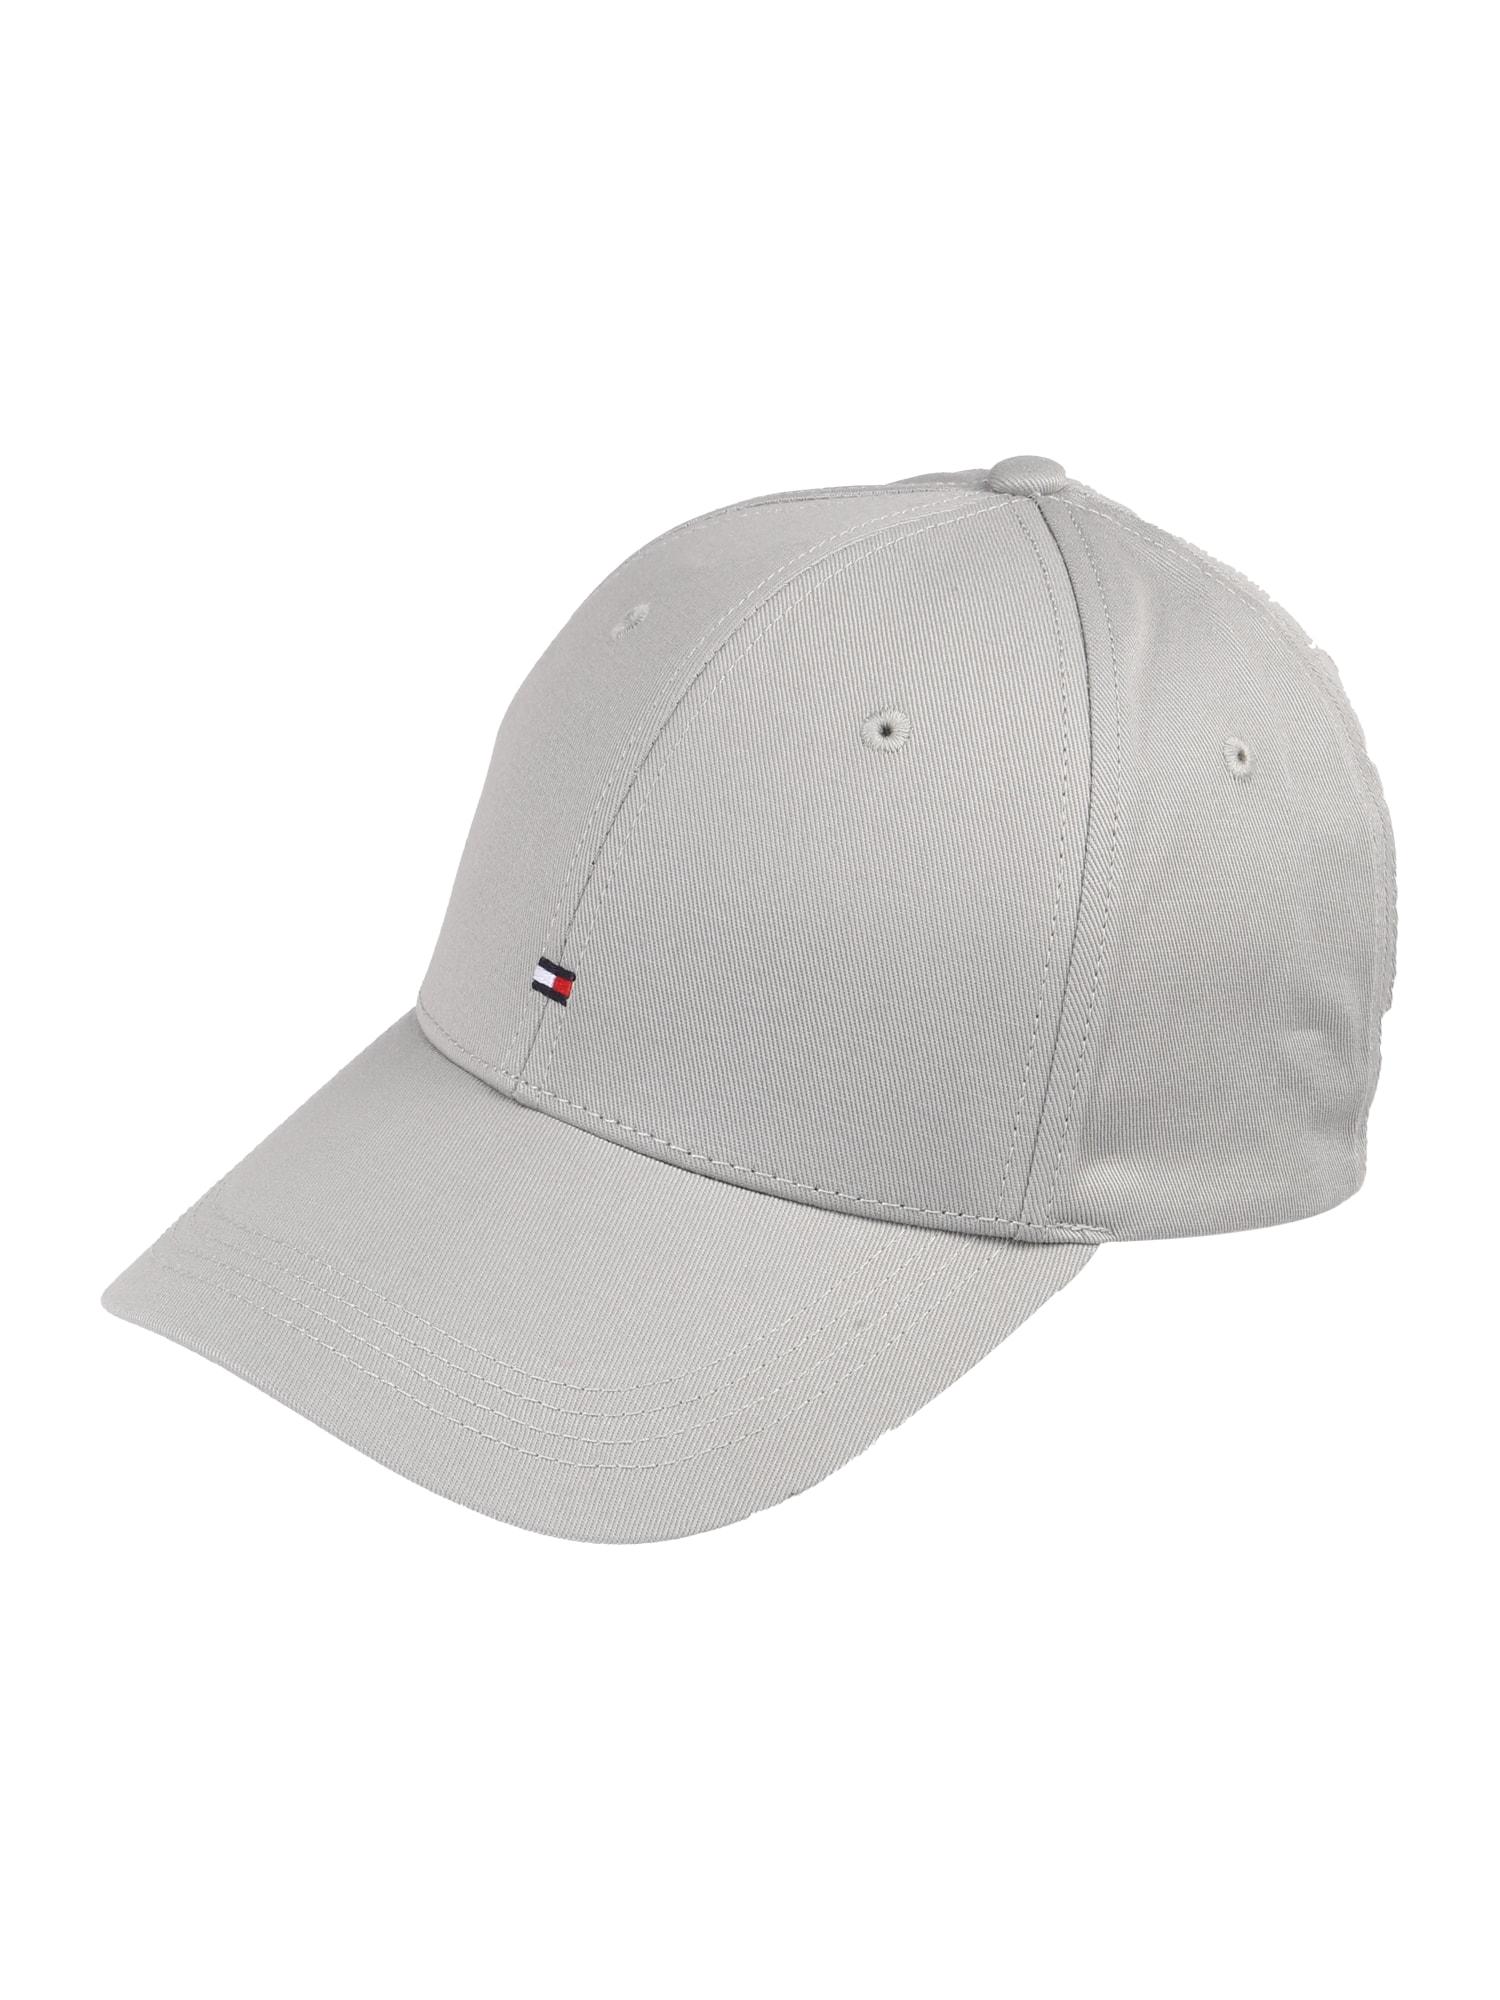 TOMMY HILFIGER Kepurė 'Classic' pilka